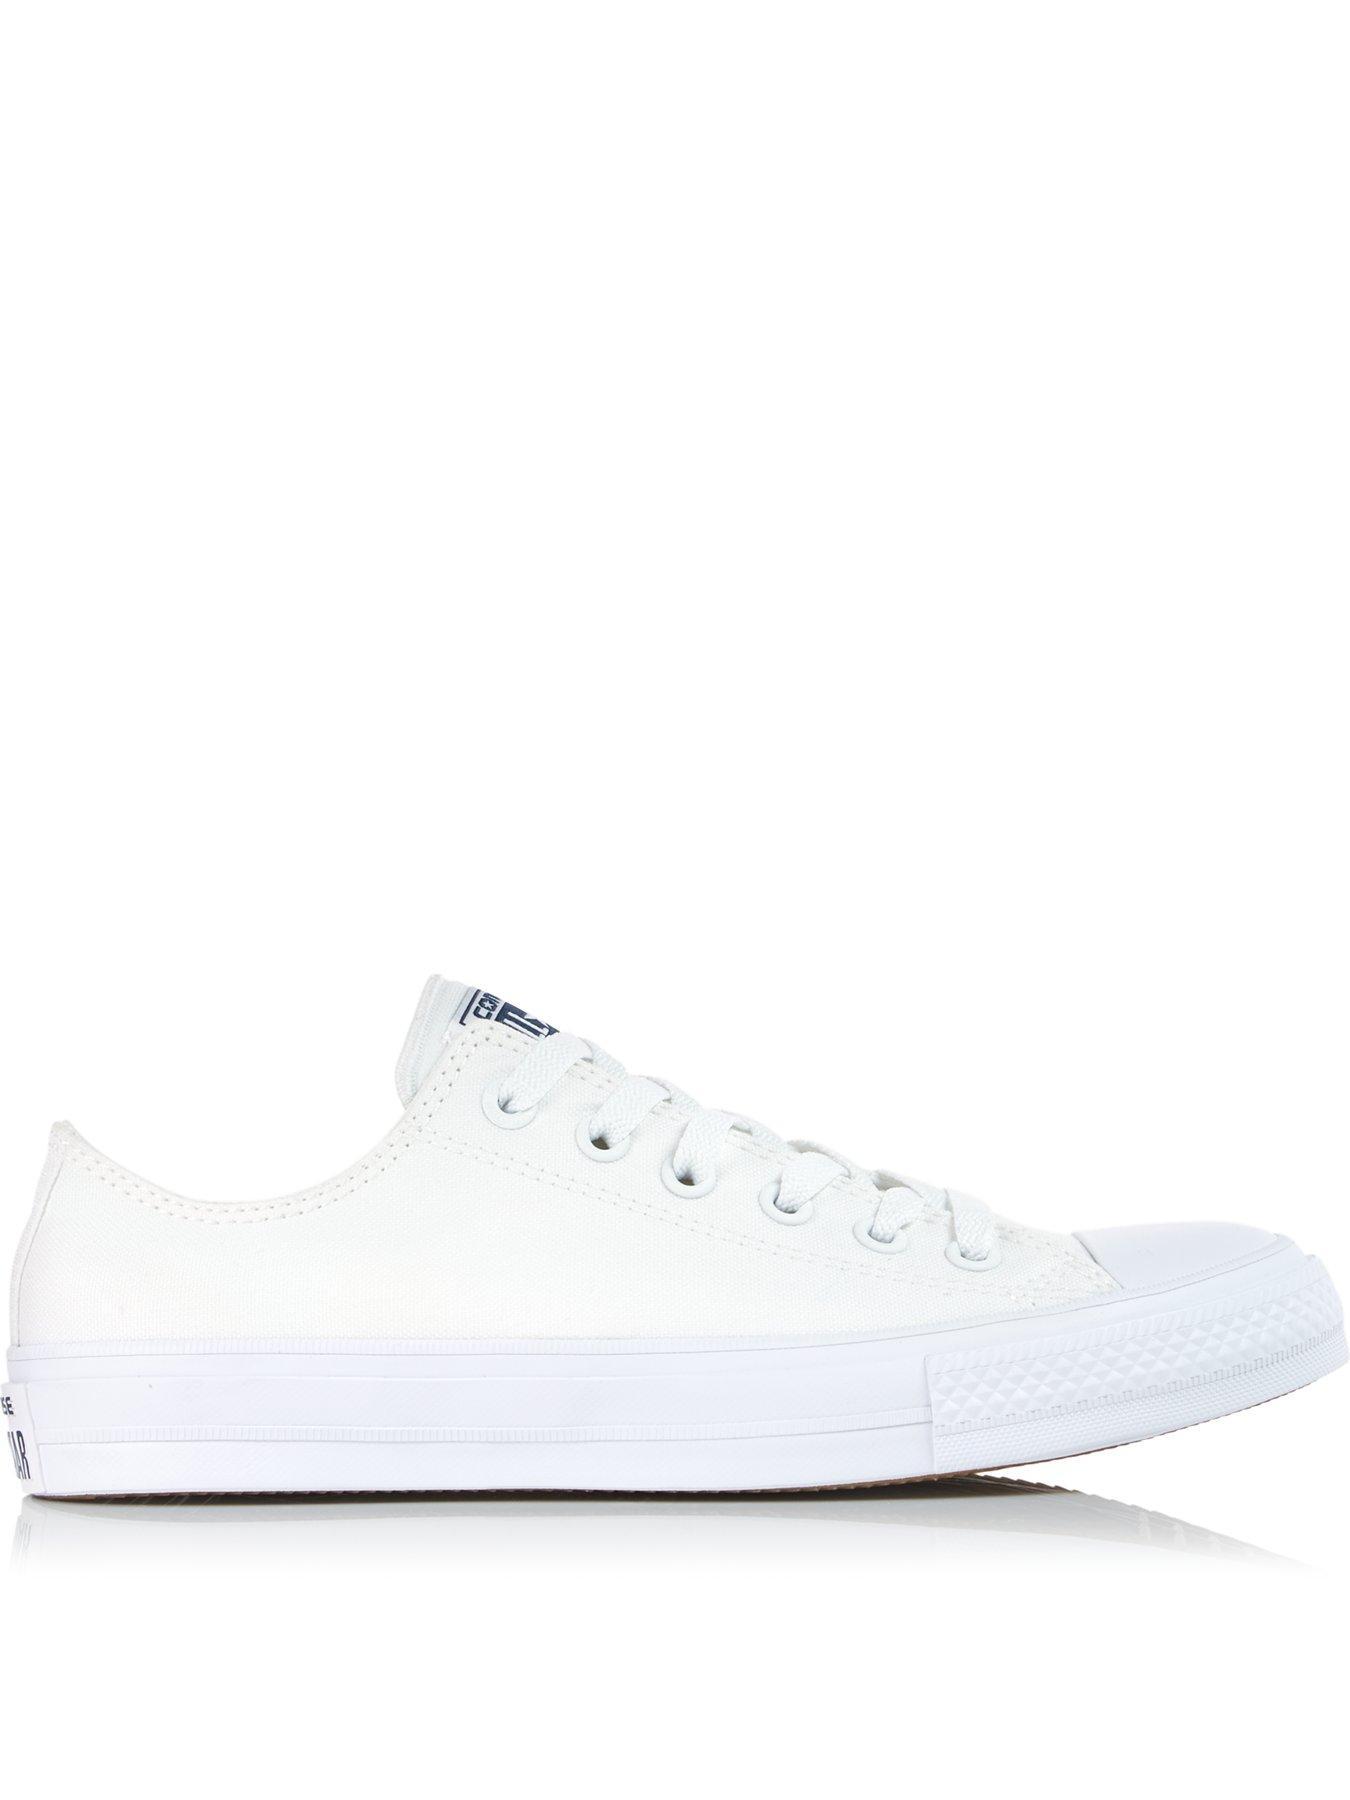 1350x1800 Converse Shoes Women Www.veryexclusive.co.uk